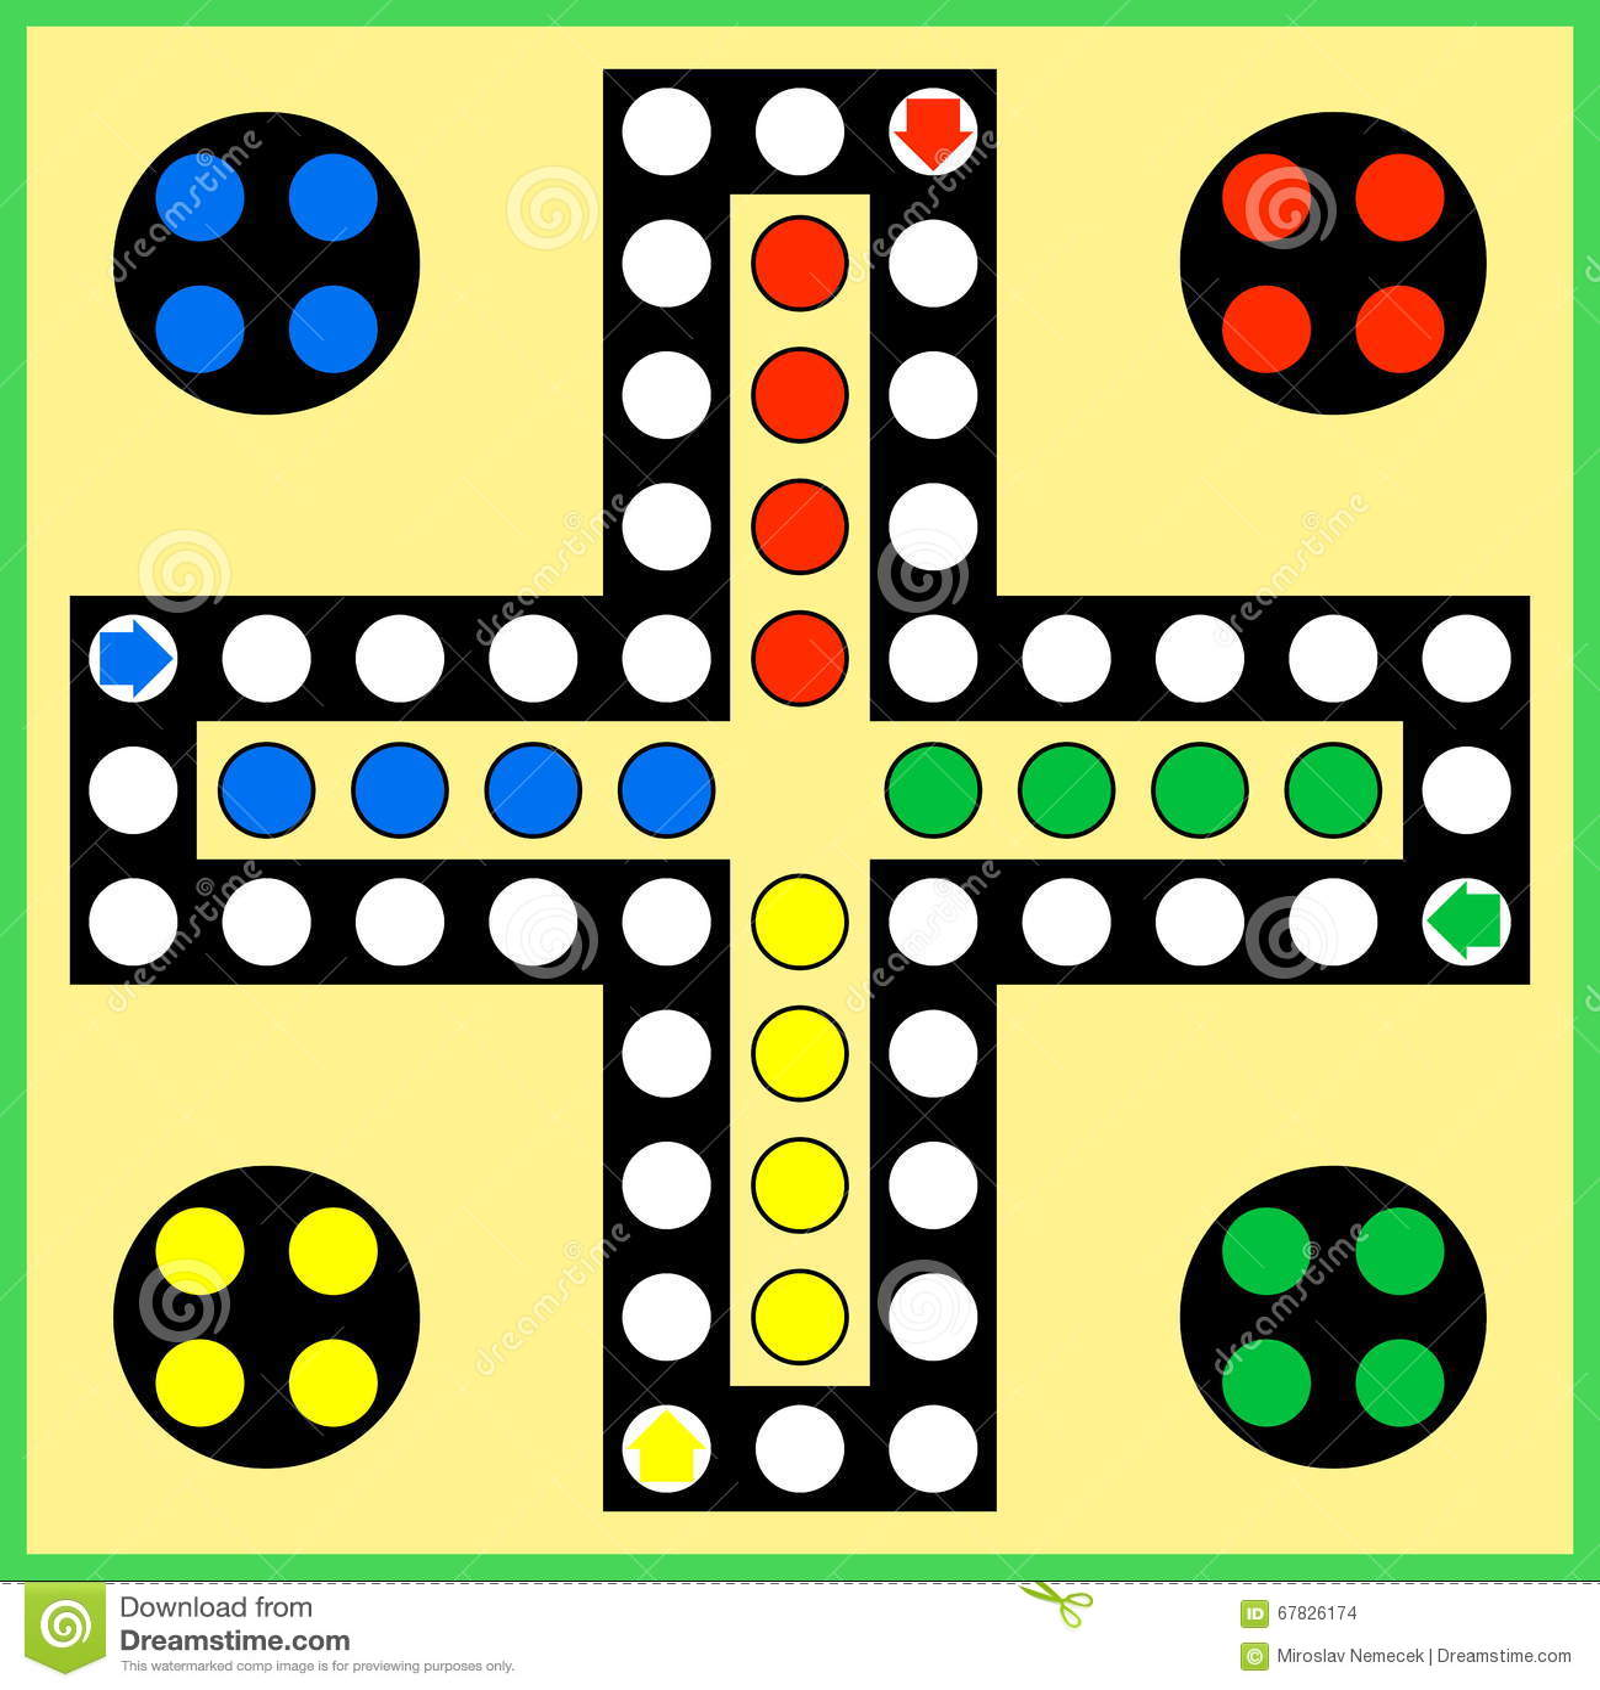 Ludo Board Game Stock Vector - Image: 67826174